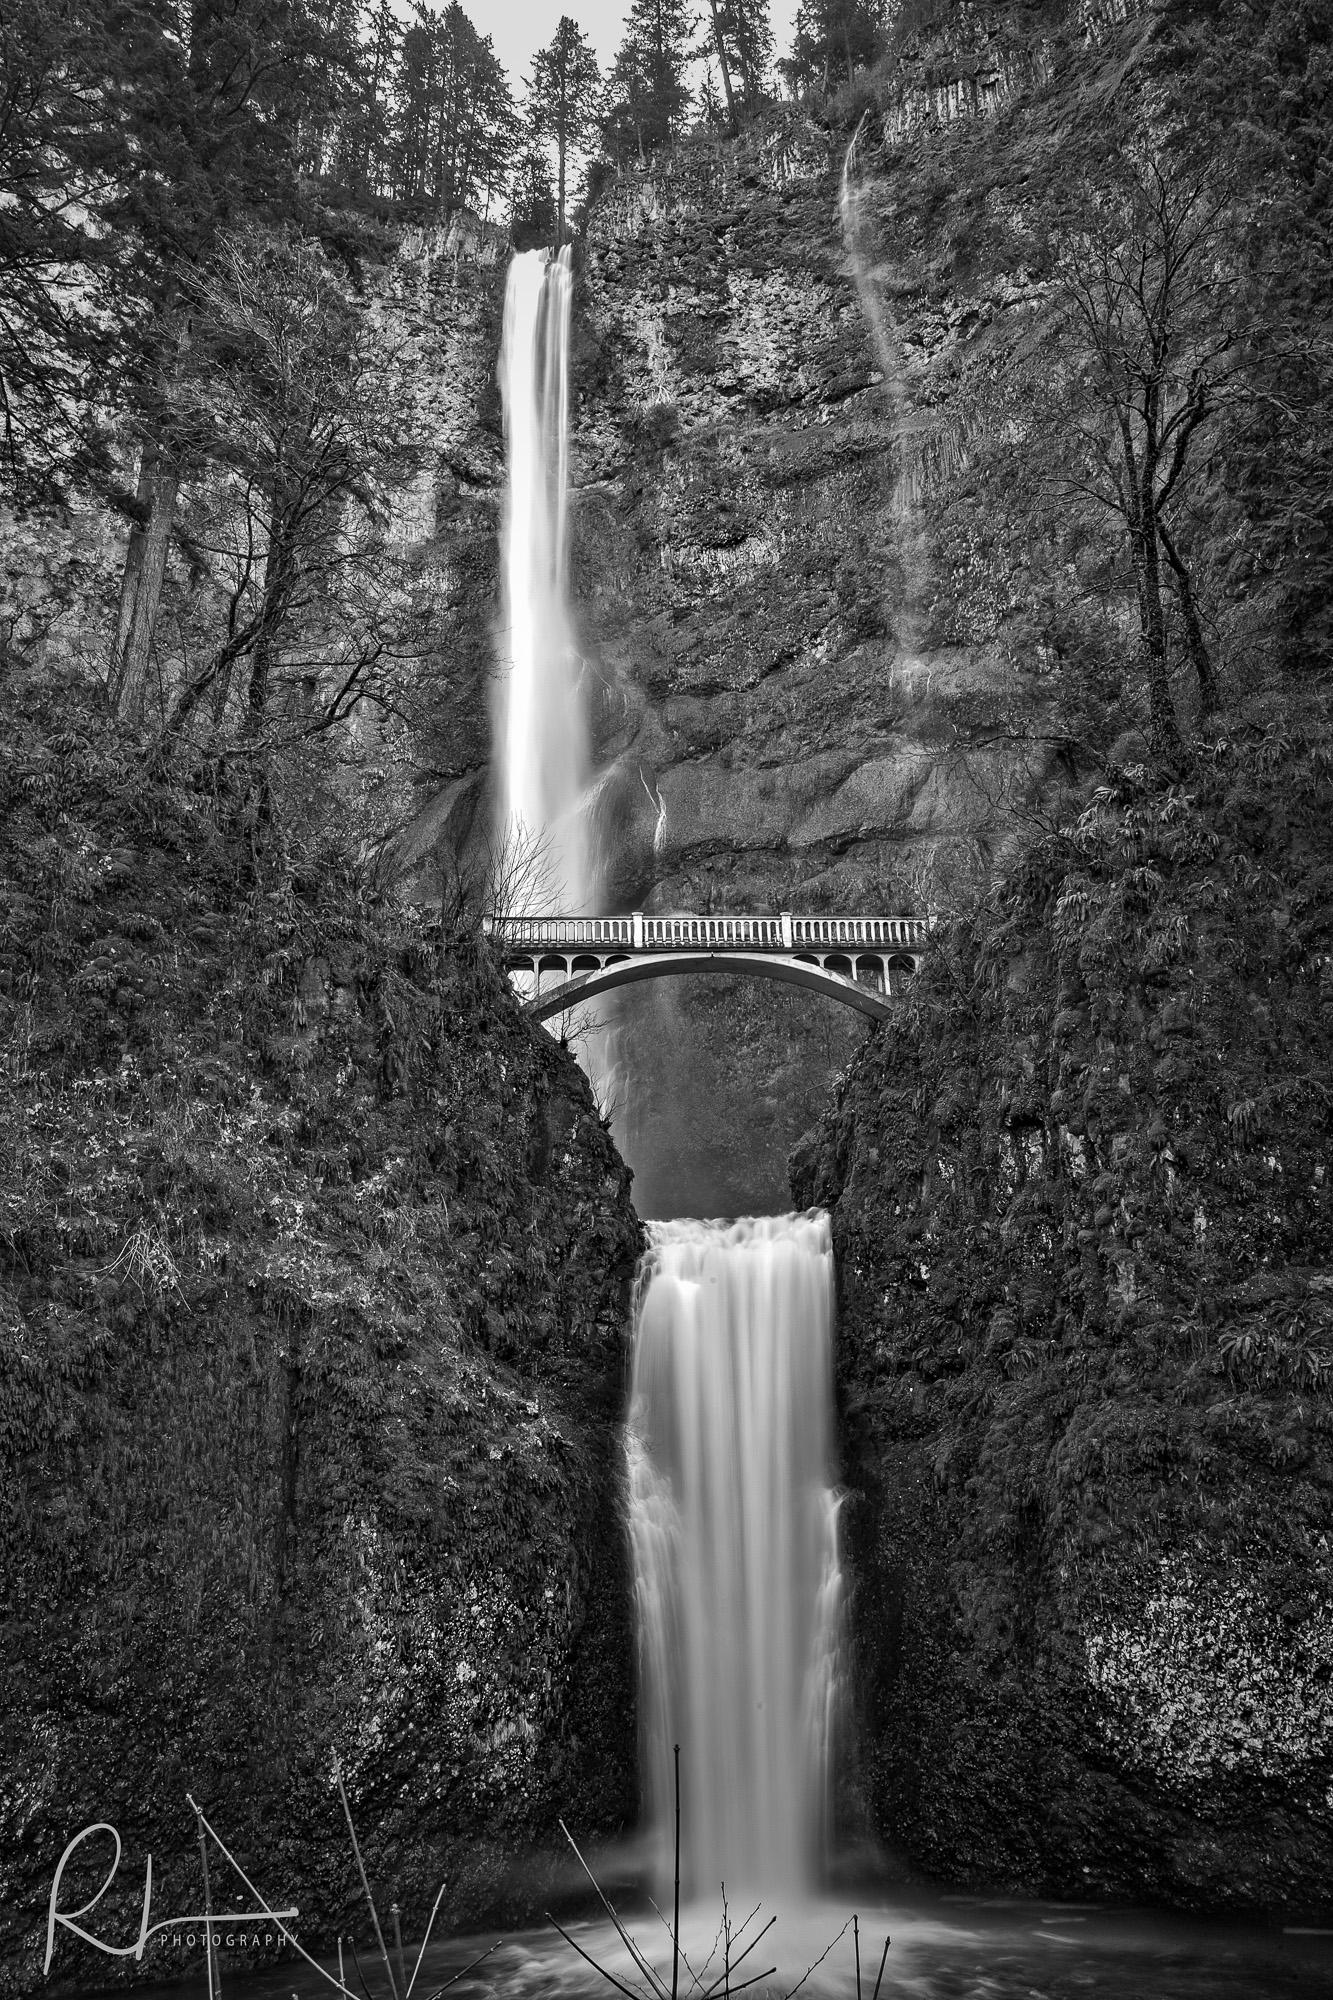 Black & White image of Multnomah Falls